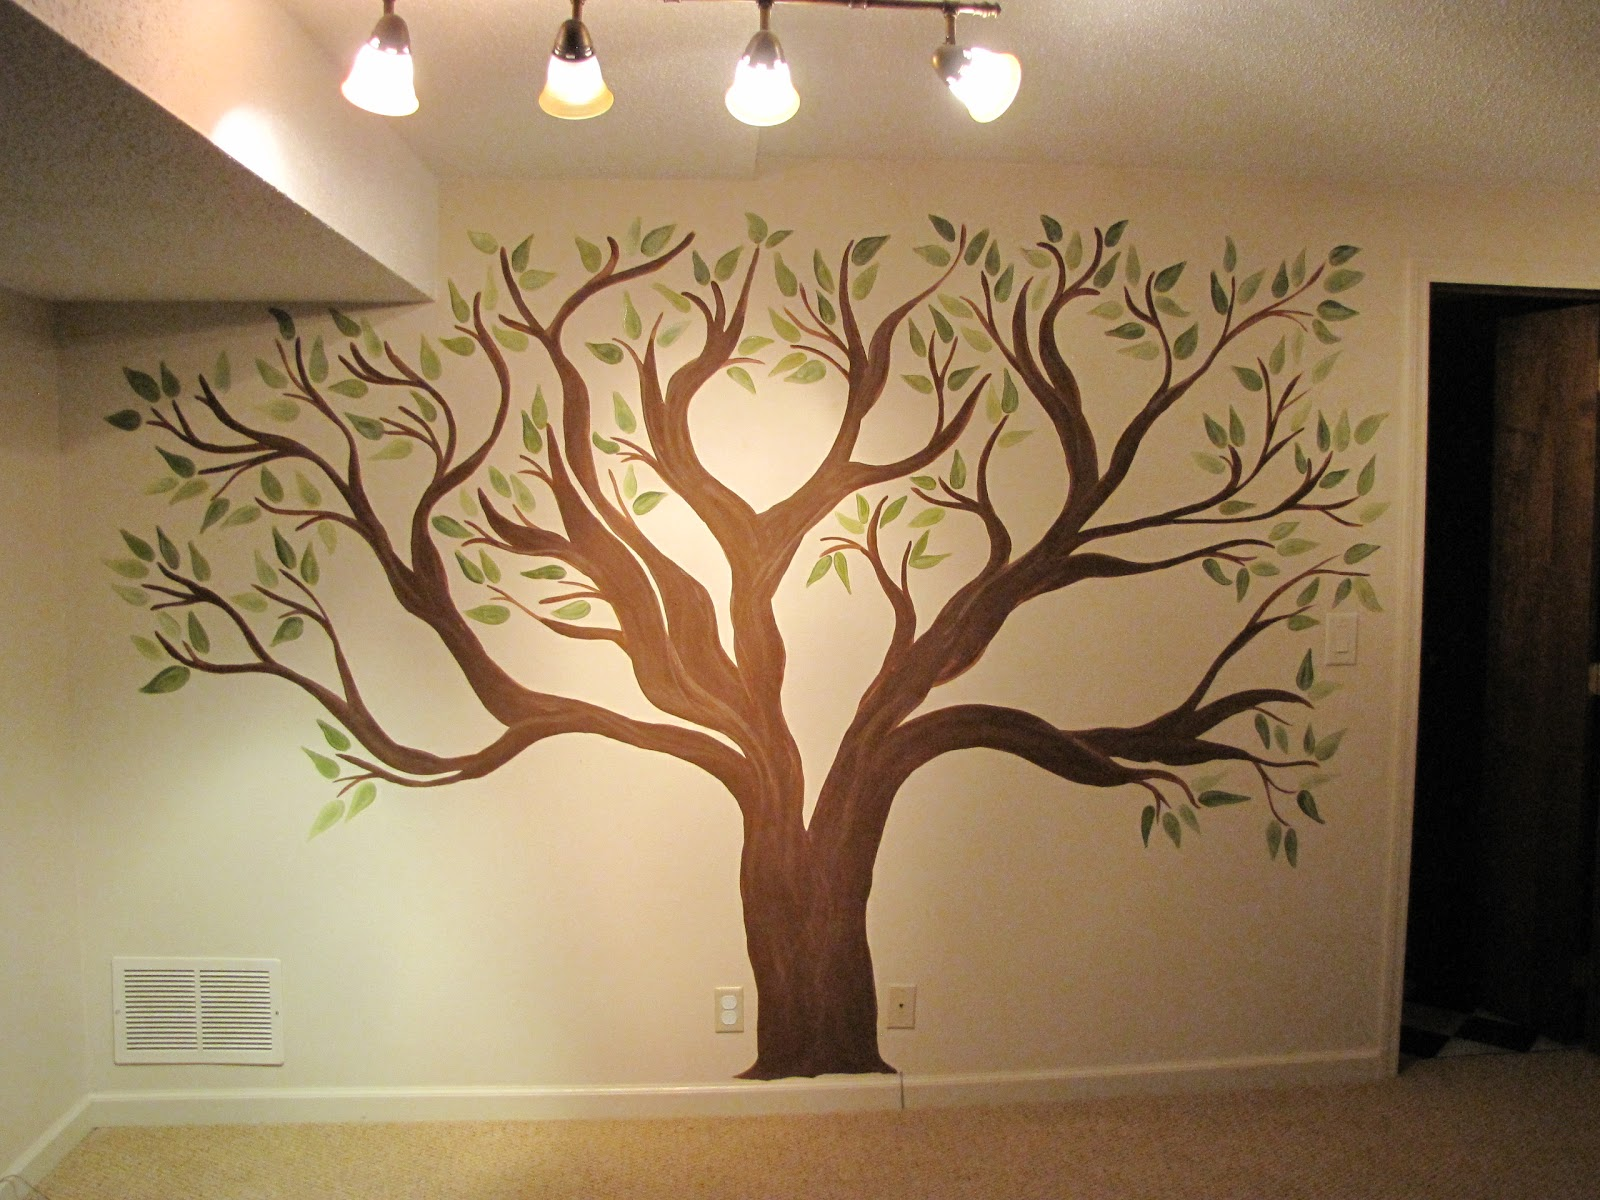 Creative Genius Art: Family Tree wall mural